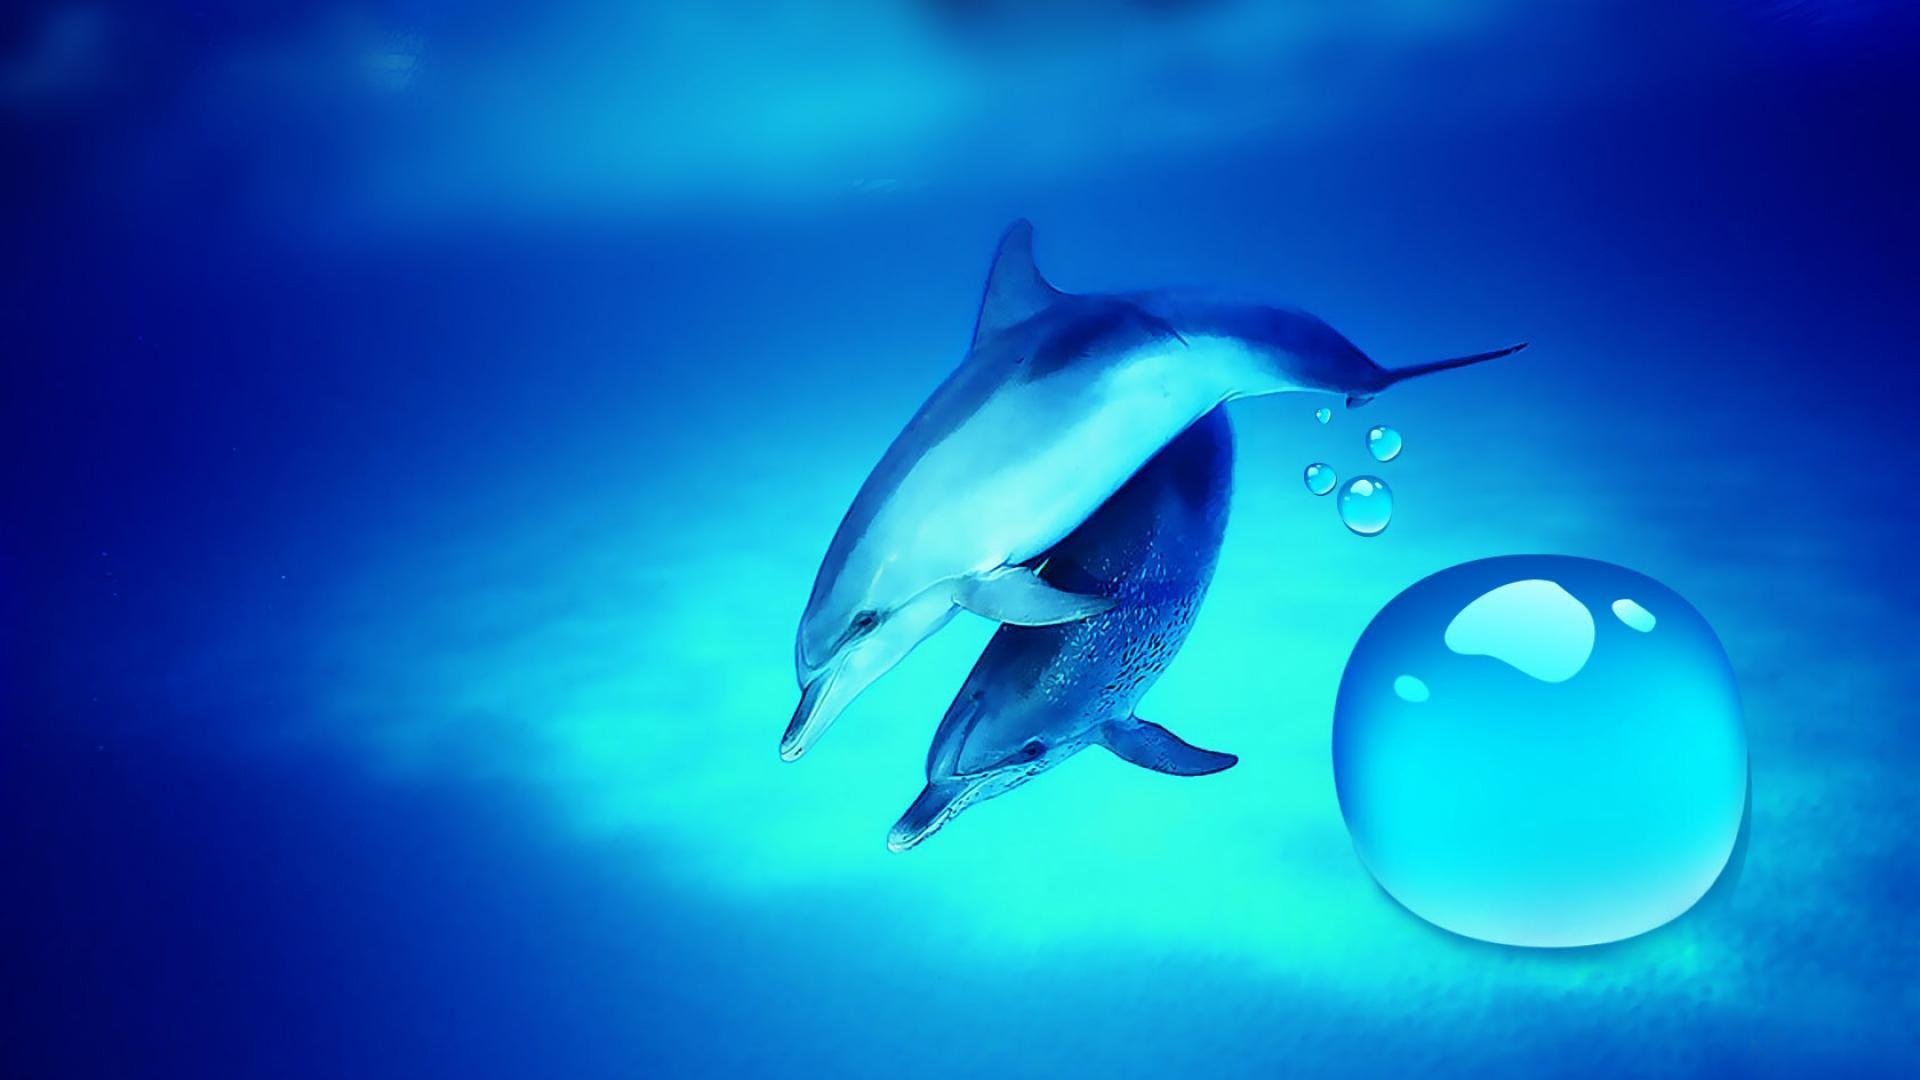 Free Dolphin Wallpapers For Desktop Wallpaper Dolphin Pictures Wallpapers  Wallpapers)